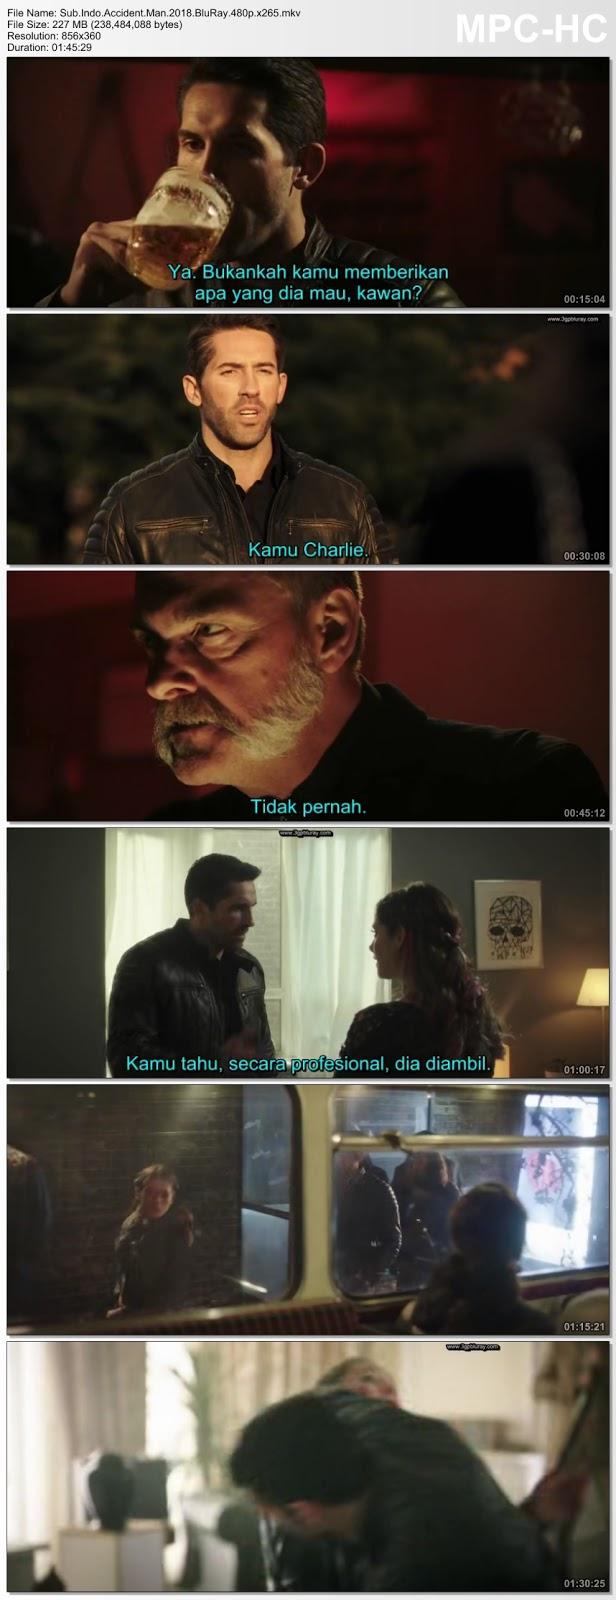 Screenshots Movie Sub.Indo.Accident Man (2018).BluRay.480p.x265.mkv